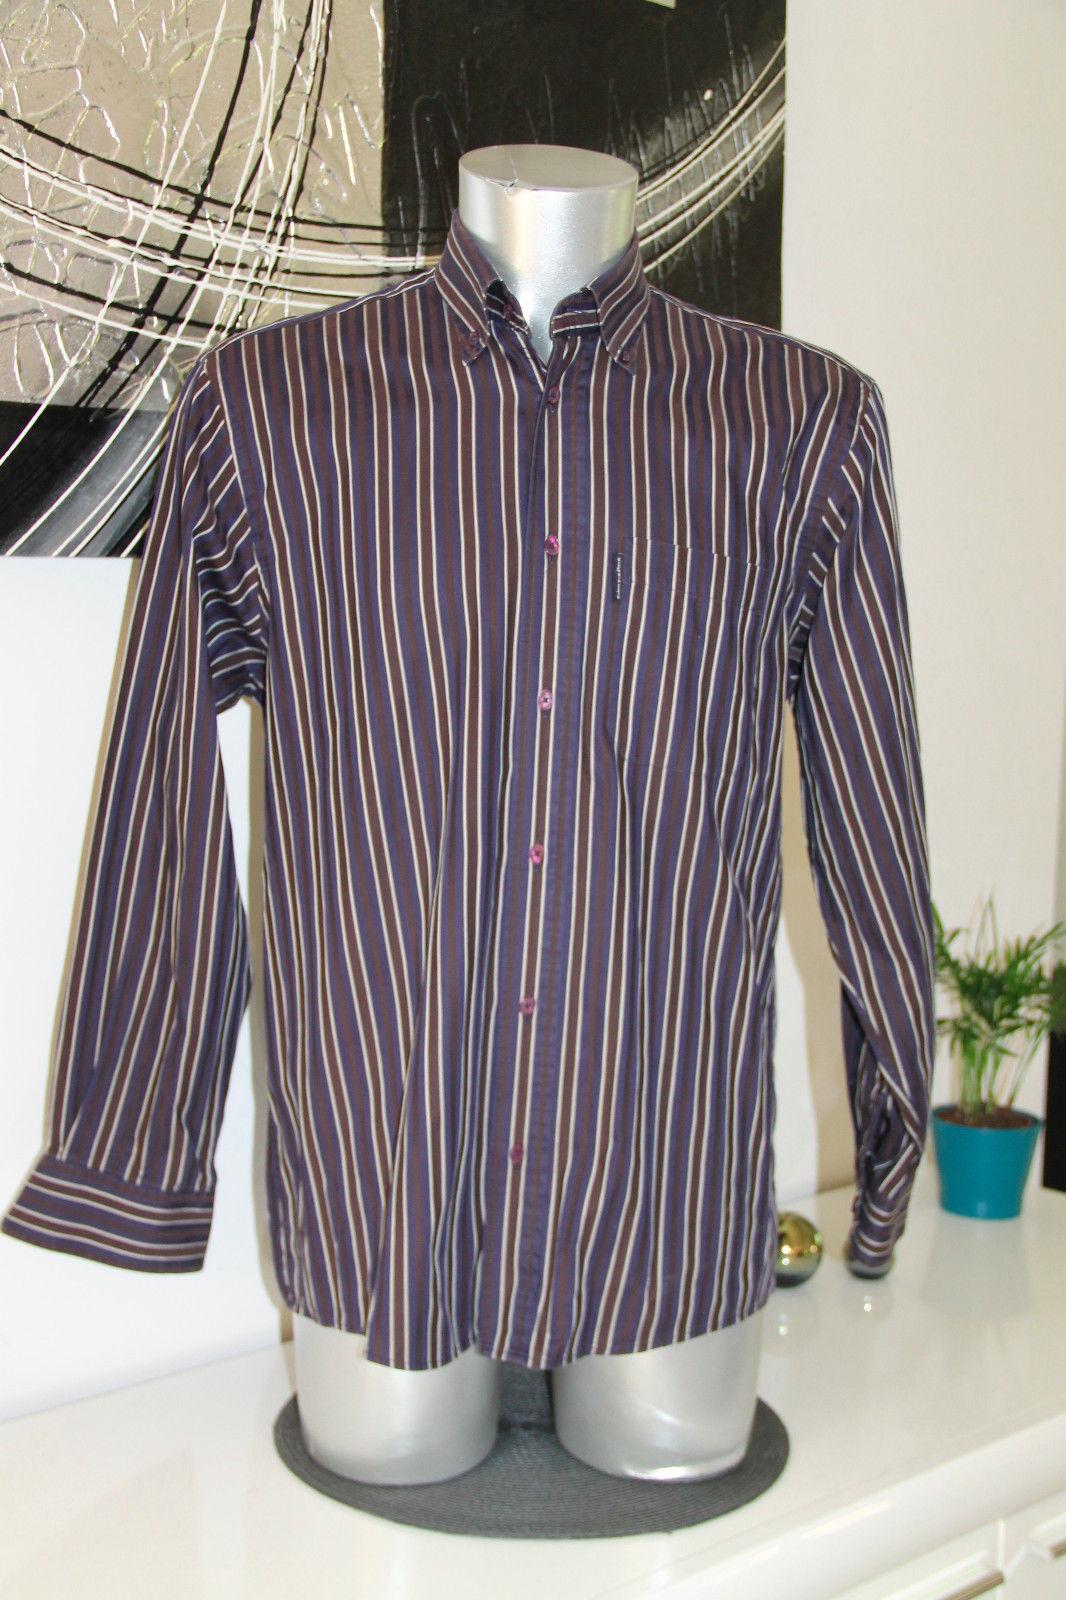 Carino a camicia blu a Carino righe EDEN PARK rugline Taglia M ECCELLENTI CONDIZIONI 2a2789